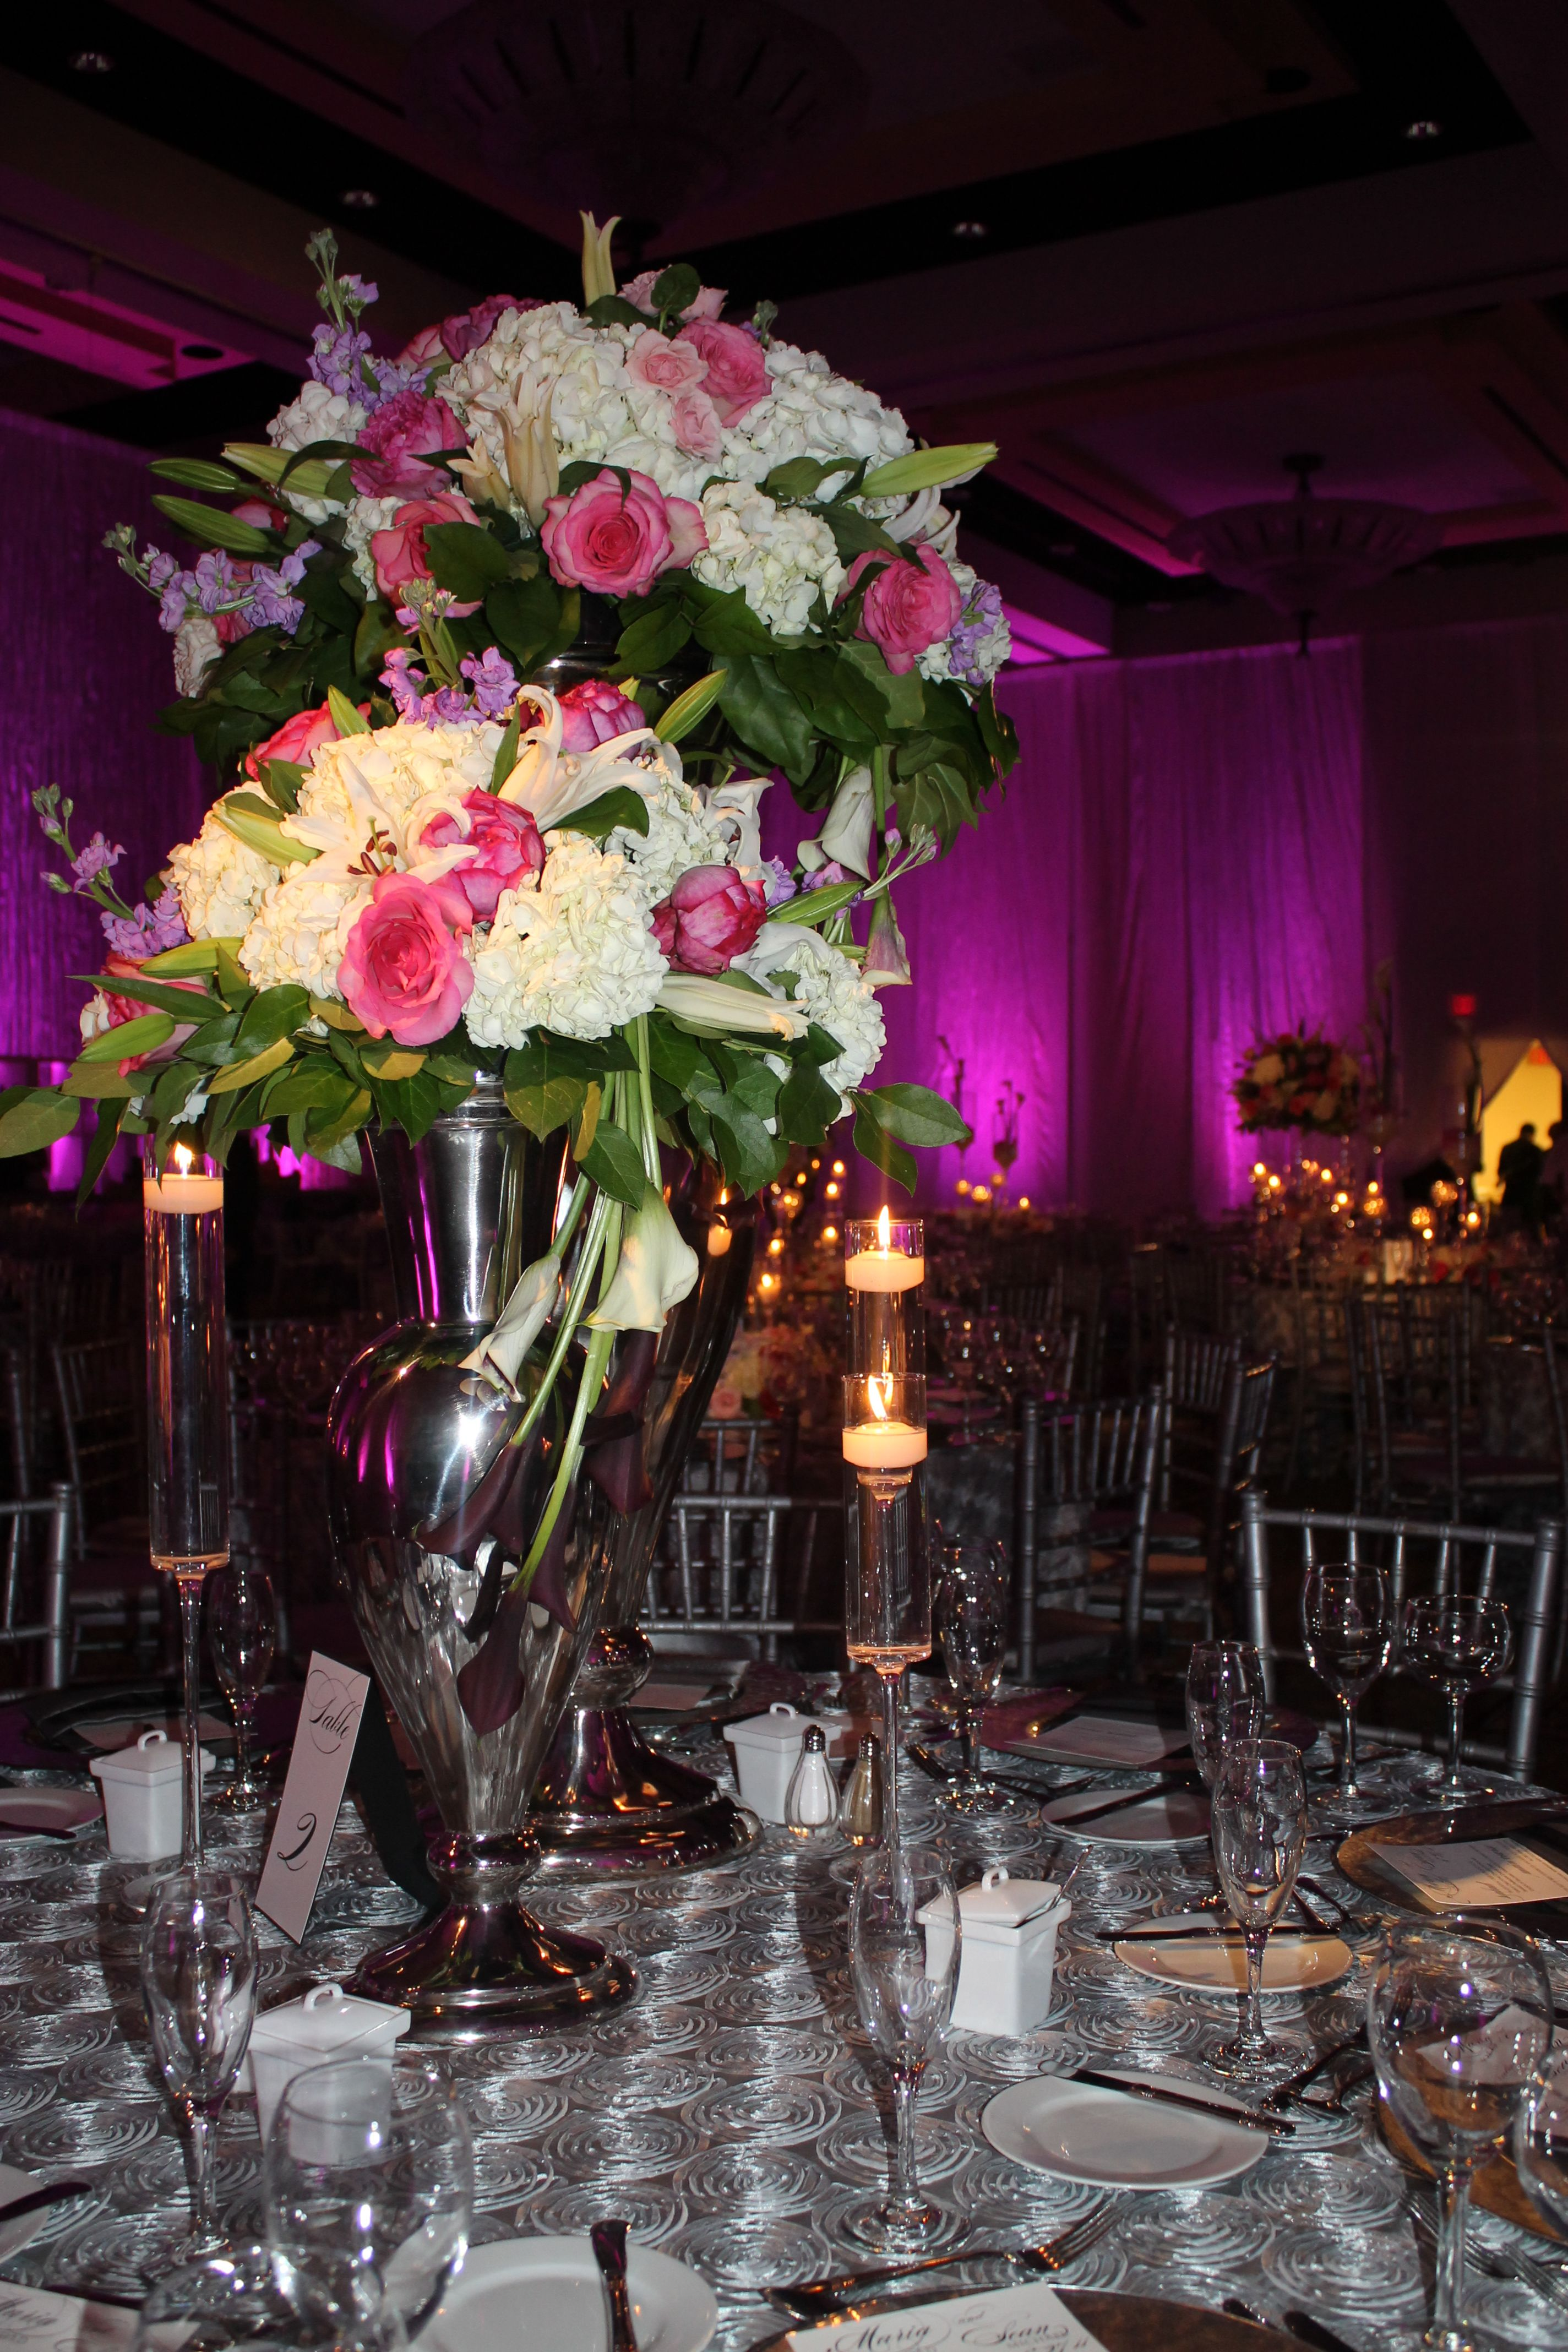 Destination wedding in Bonita Springs, FL. Flowers and